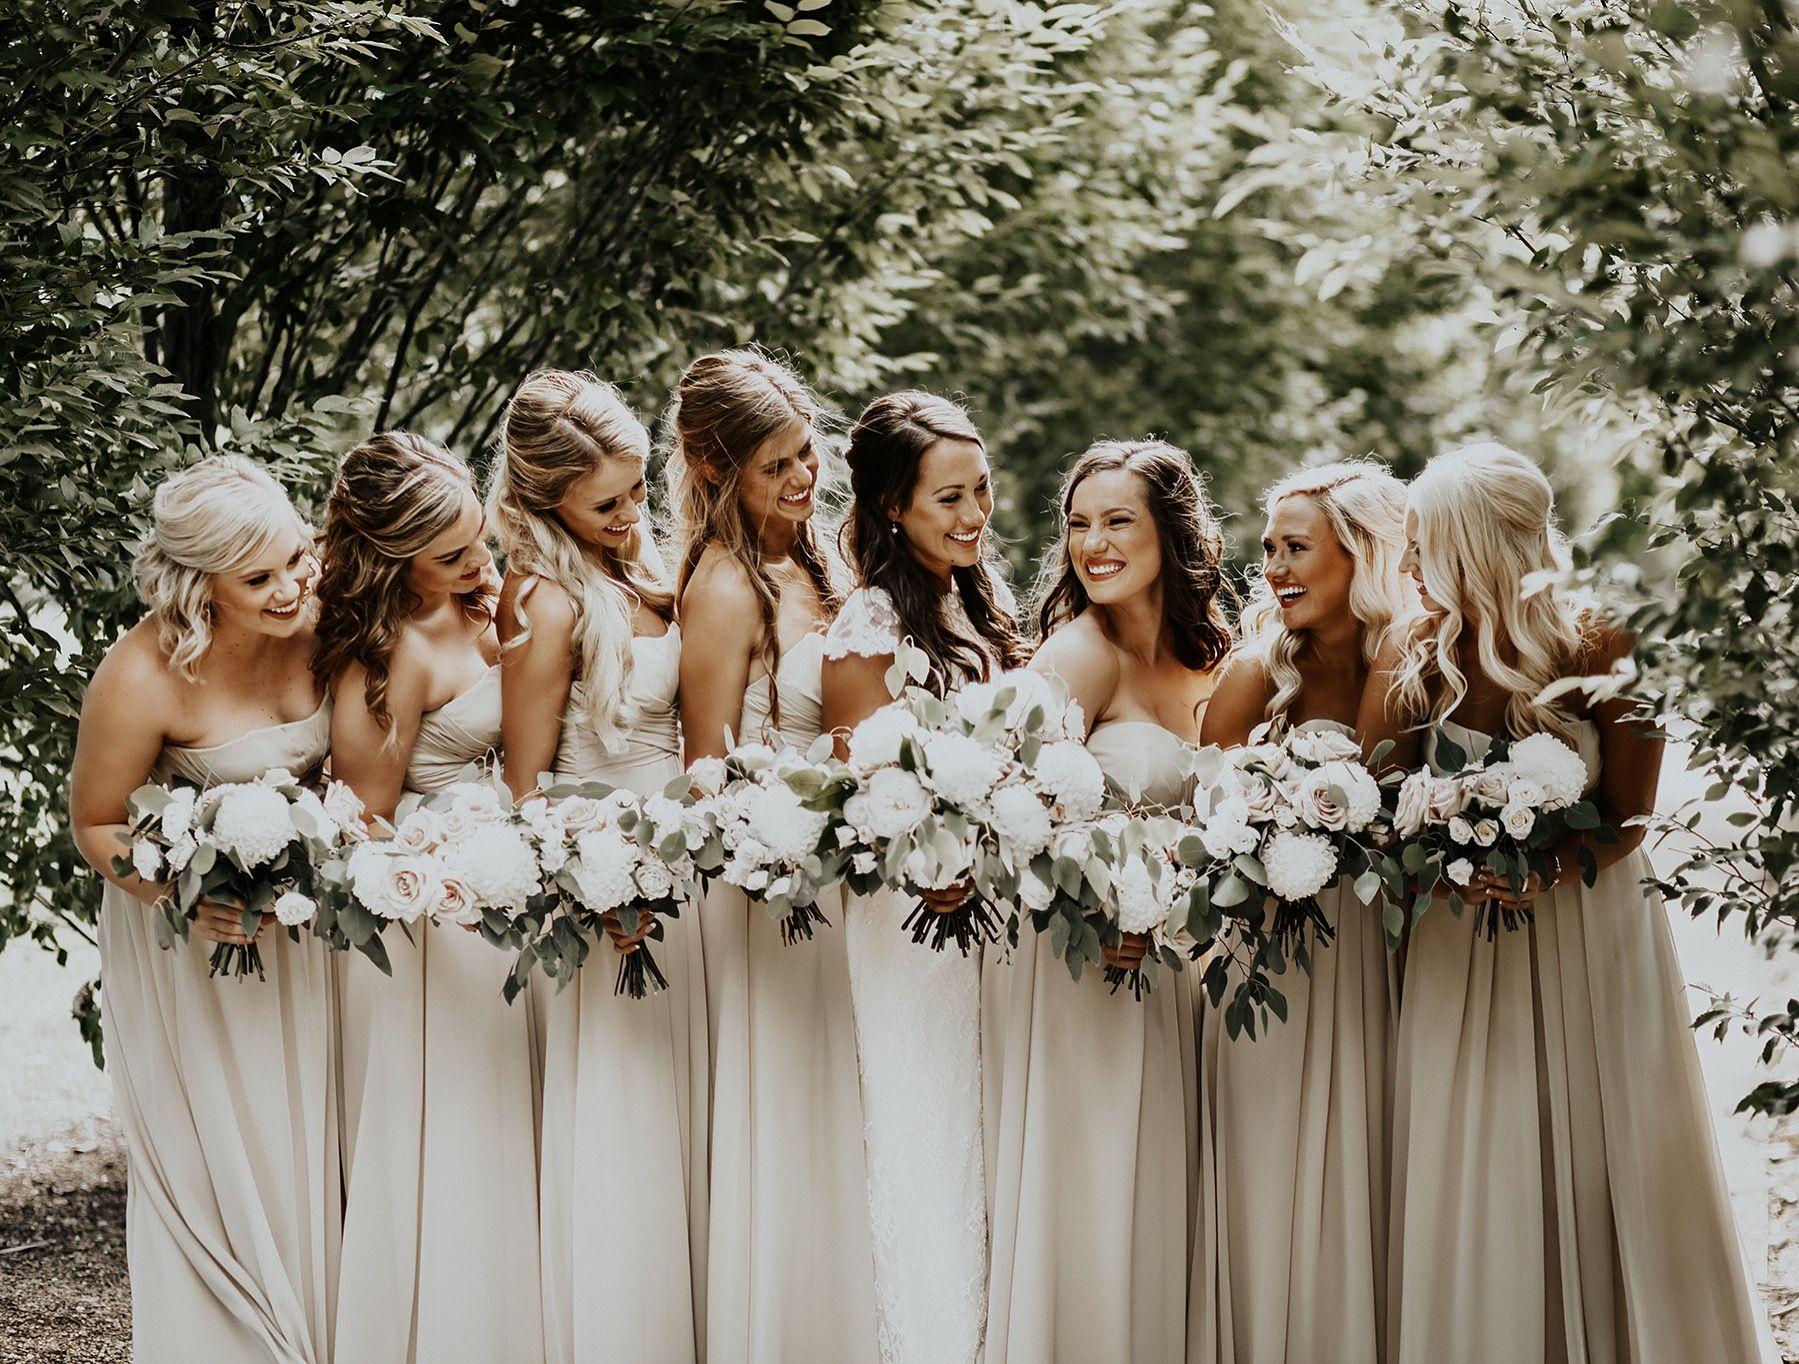 Neutral bridesmaid dresses lindsey dian photography pinterest neutral bridesmaid dresses ombrellifo Images